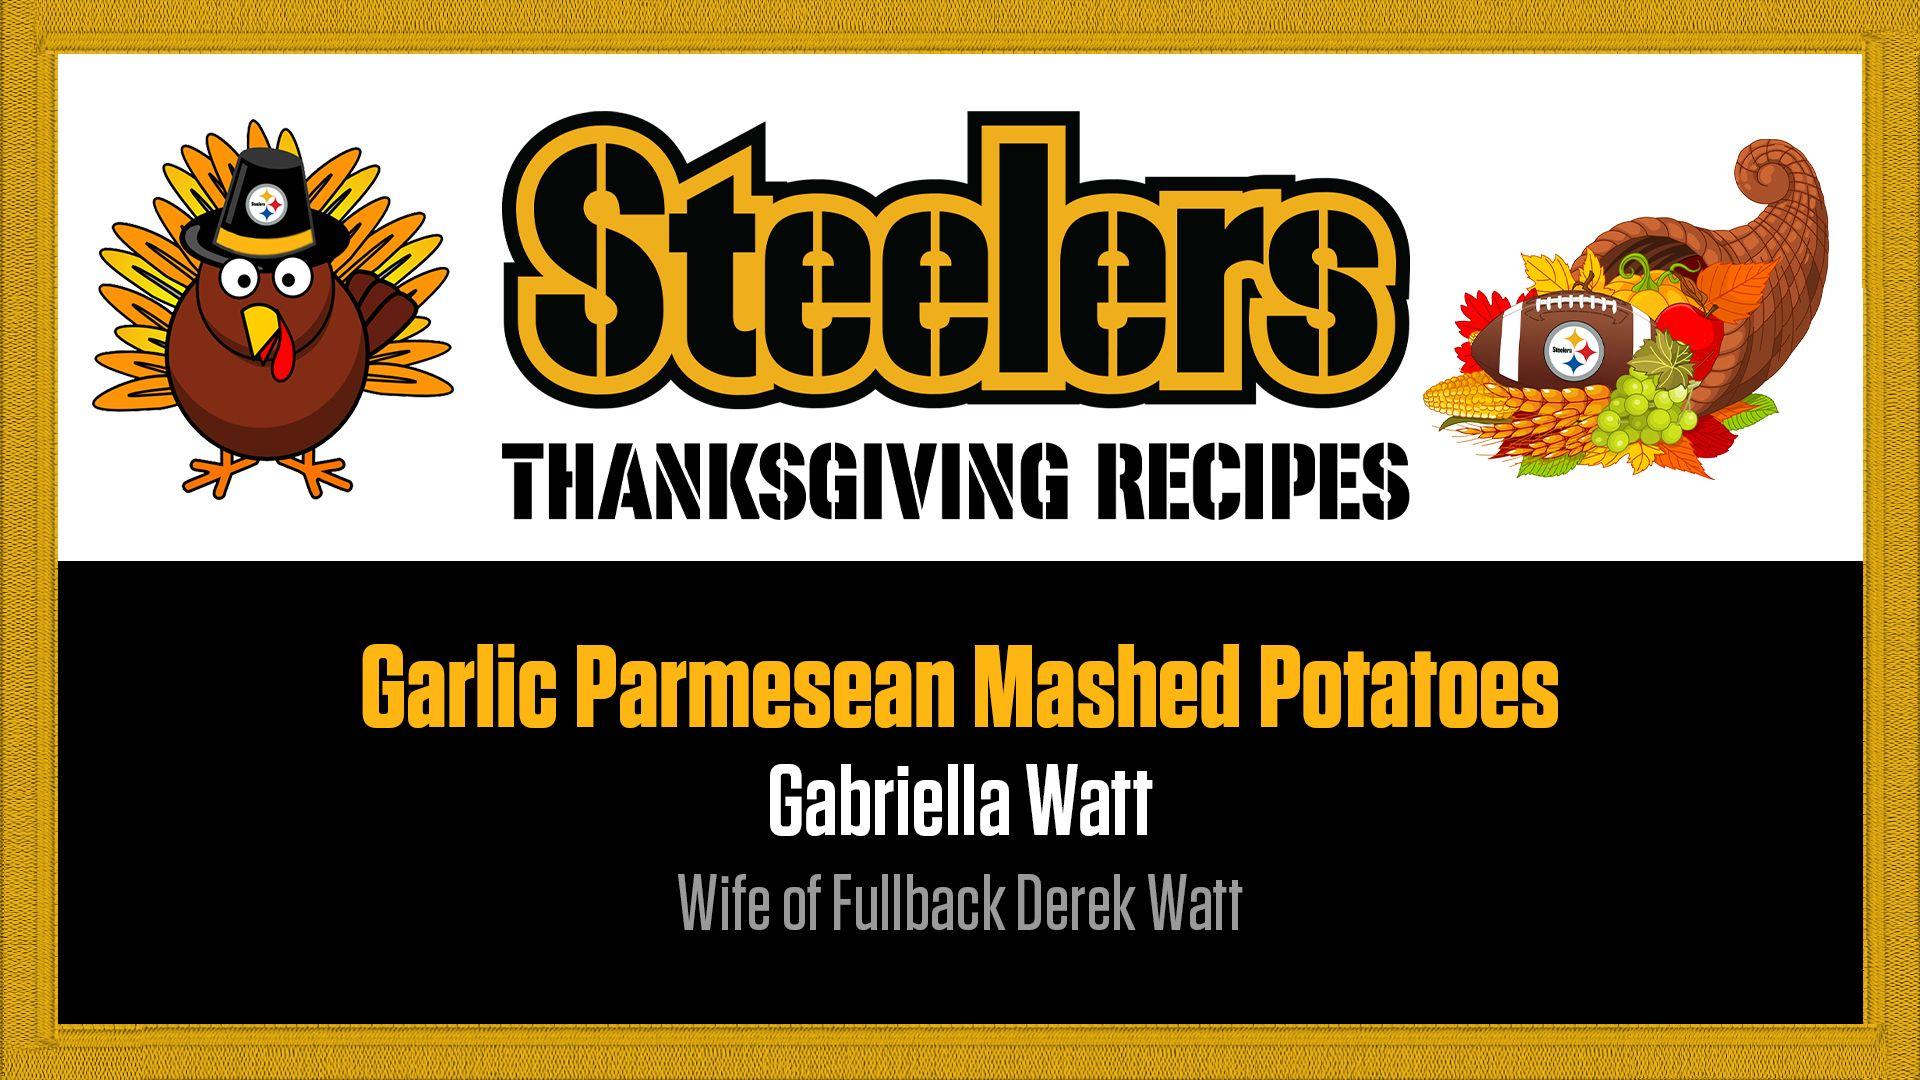 Recipe - garlic parmesean mashed potatoes_gabriella watt